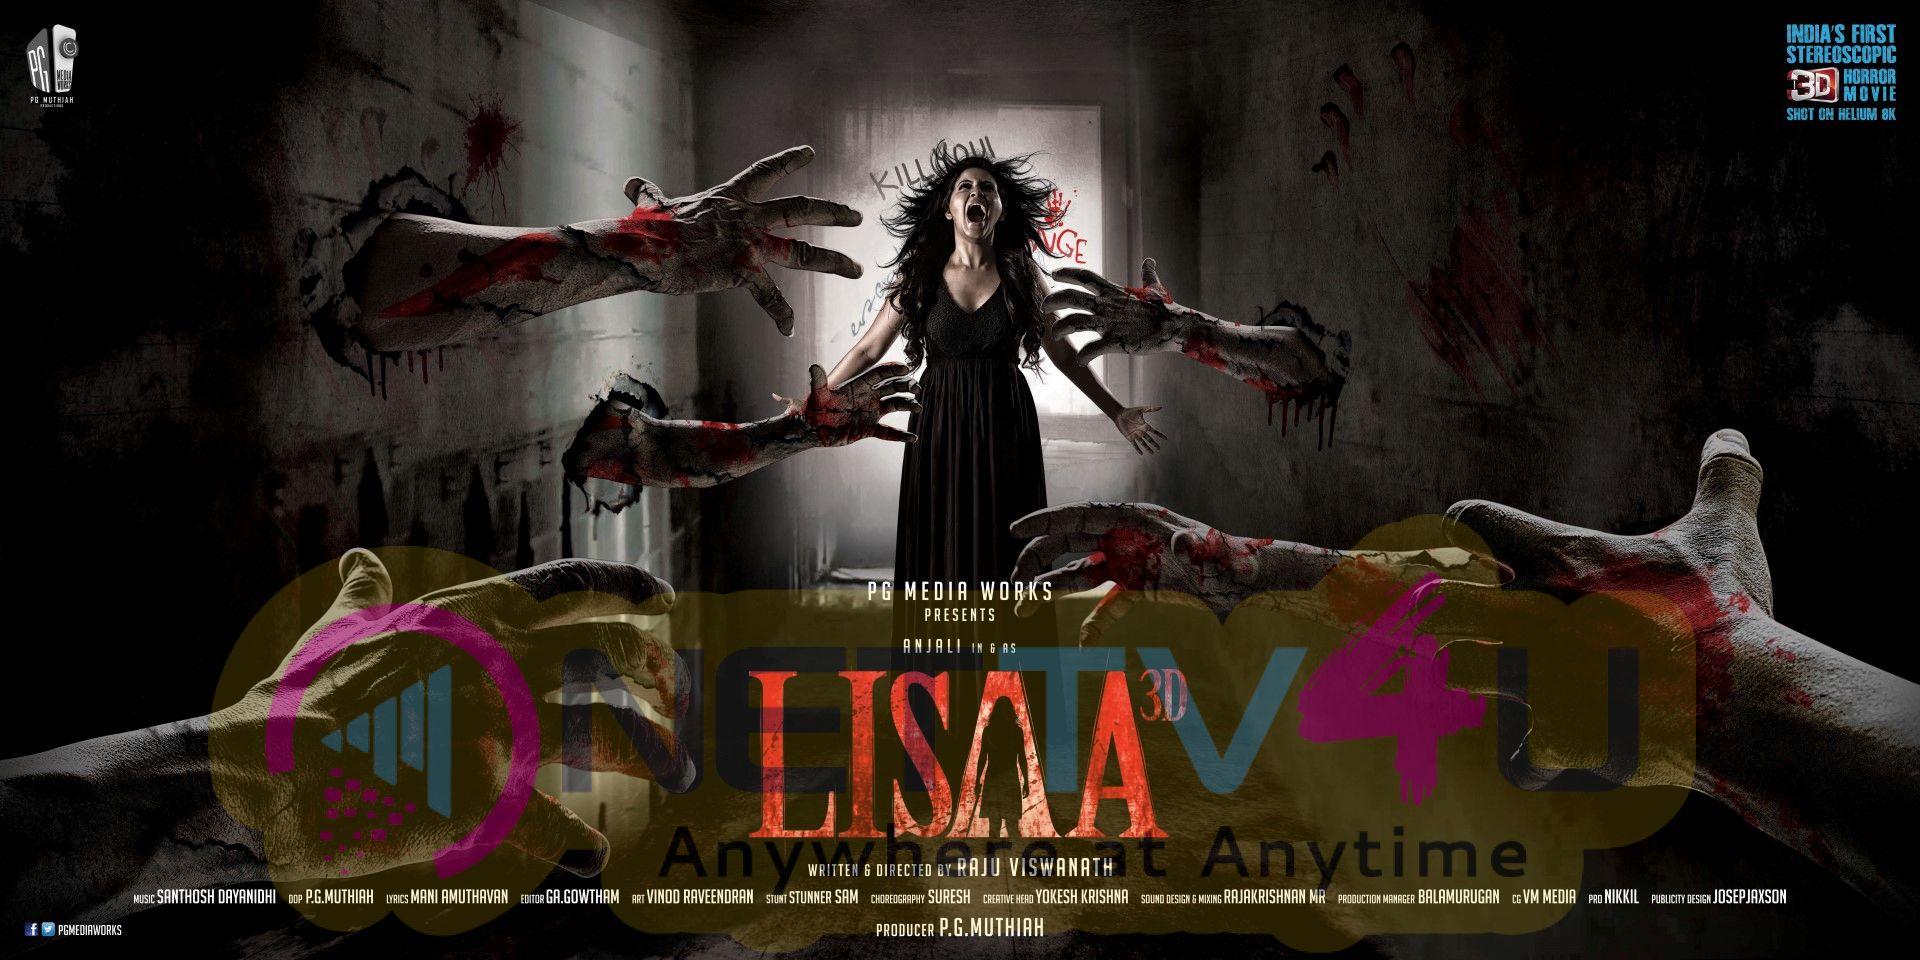 Lisaa Movie Posters